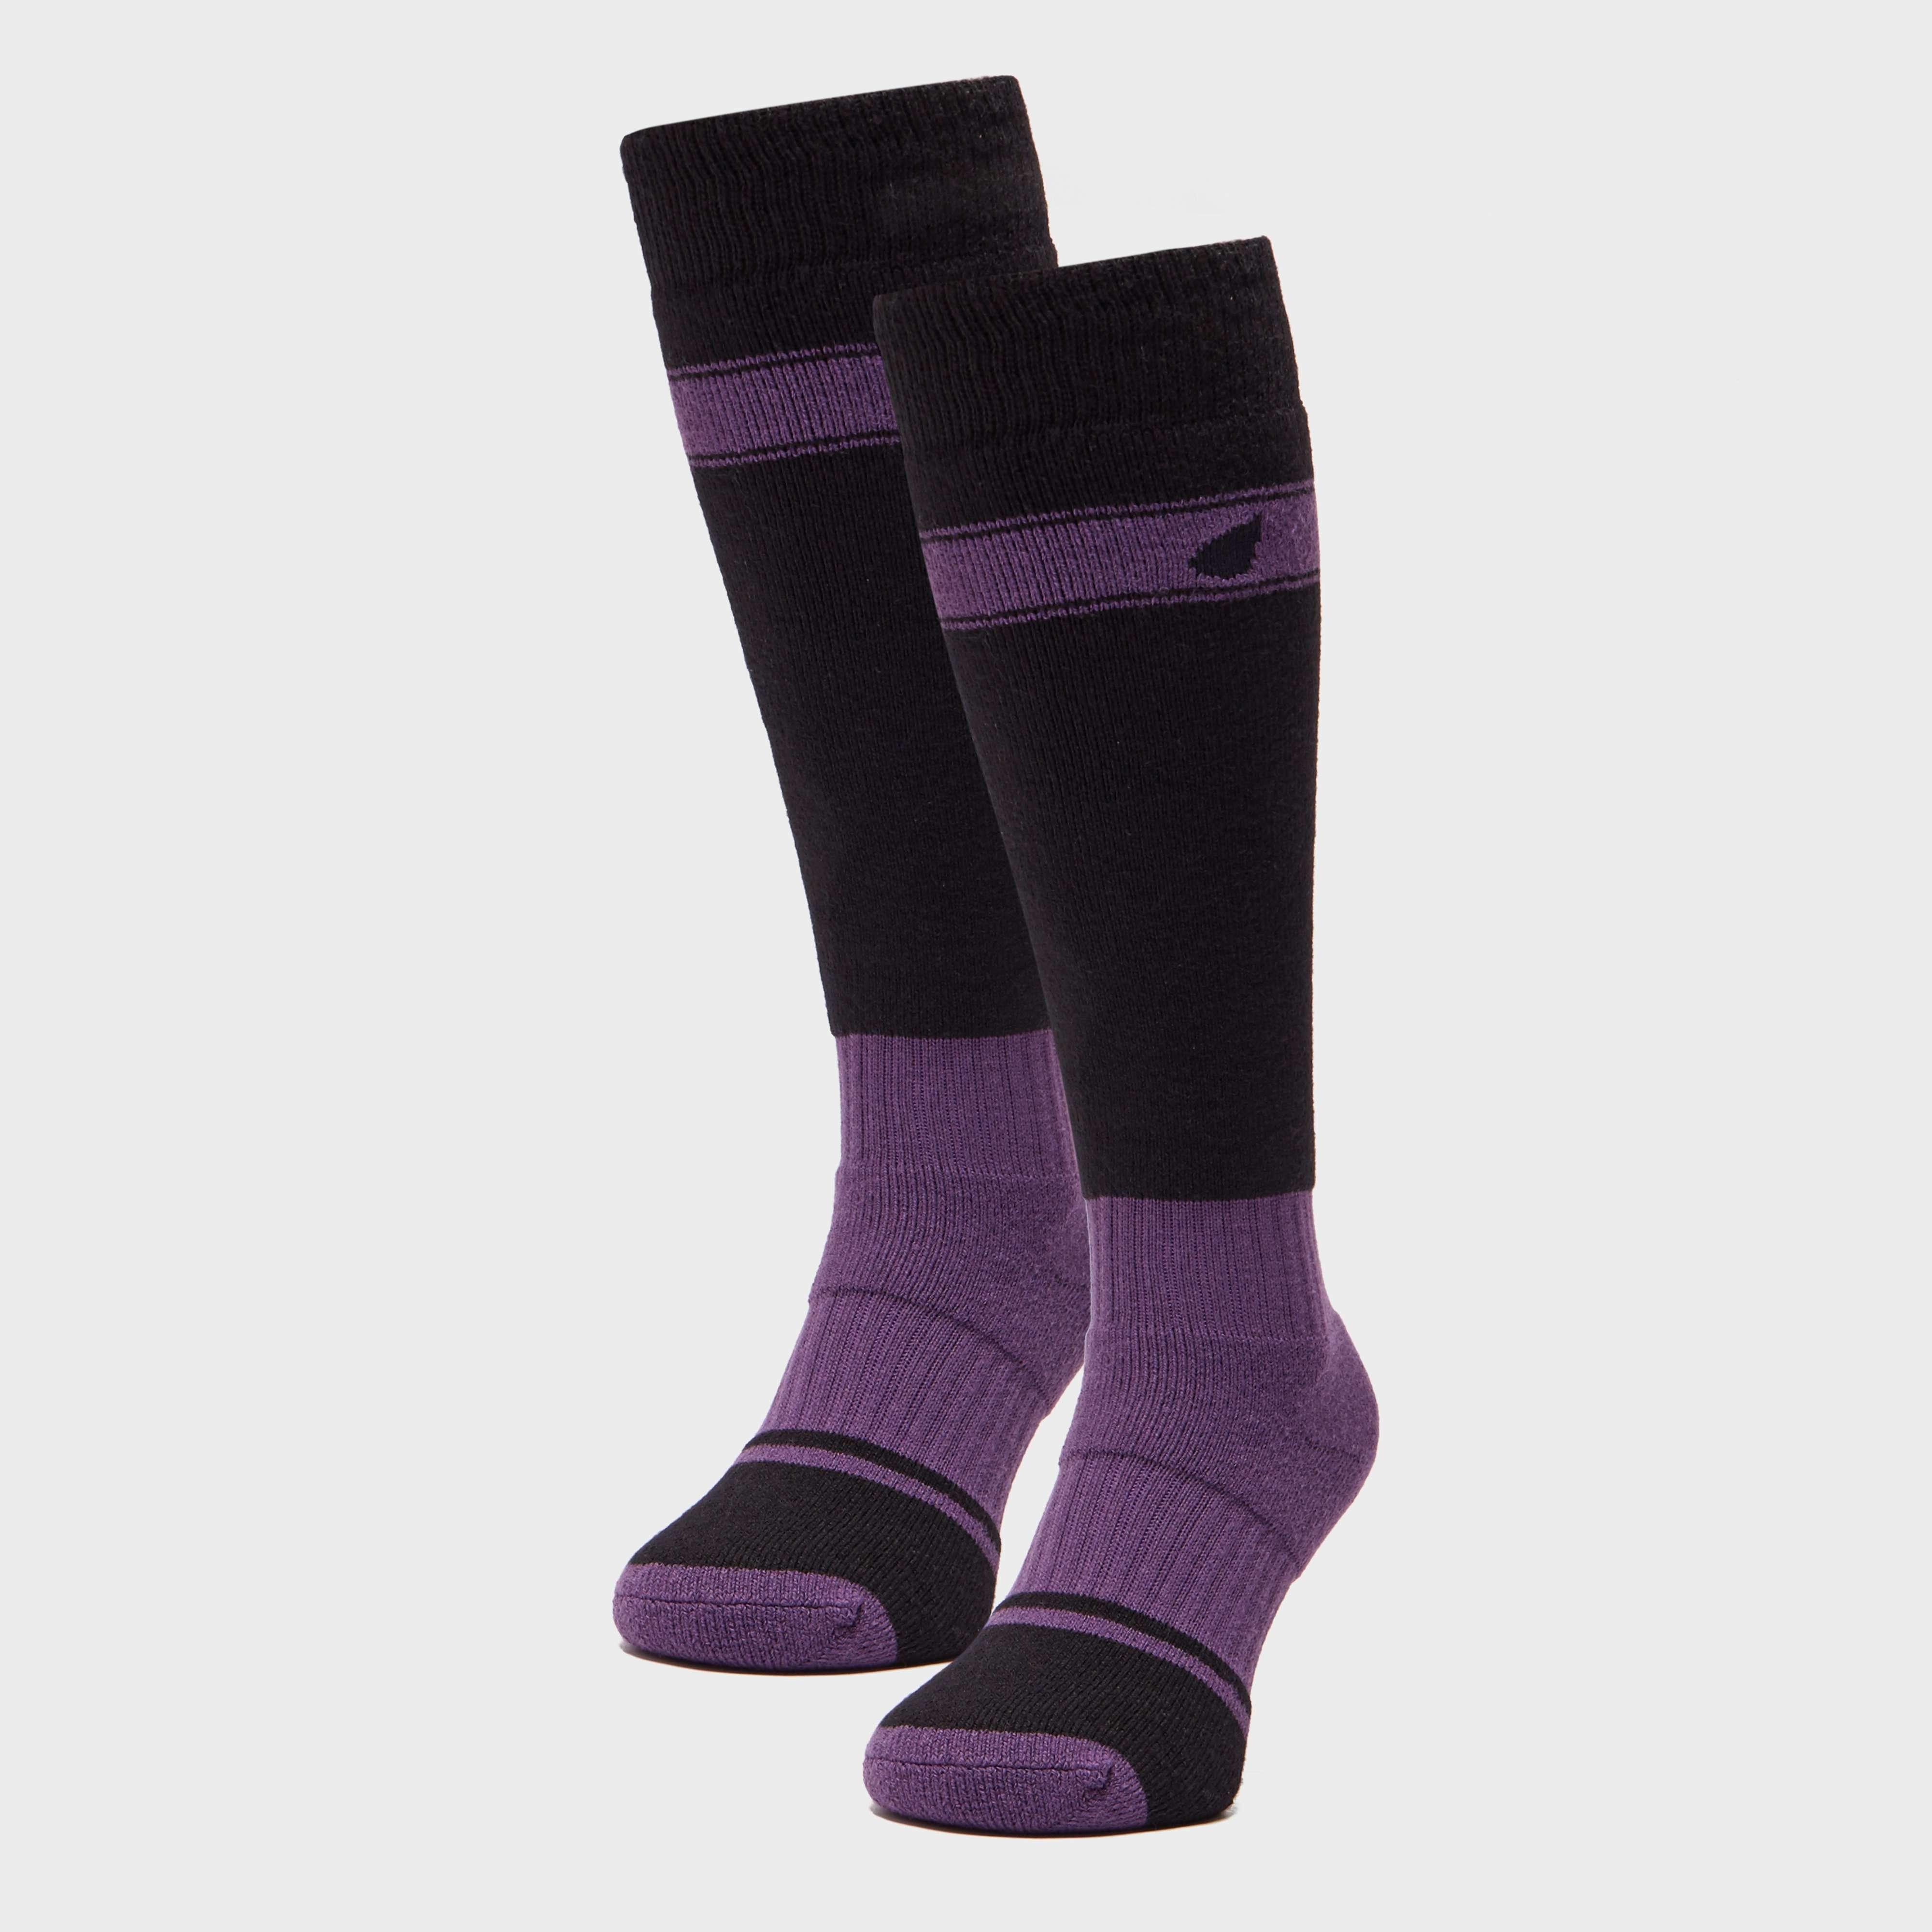 PETER STORM Women's Ski Socks